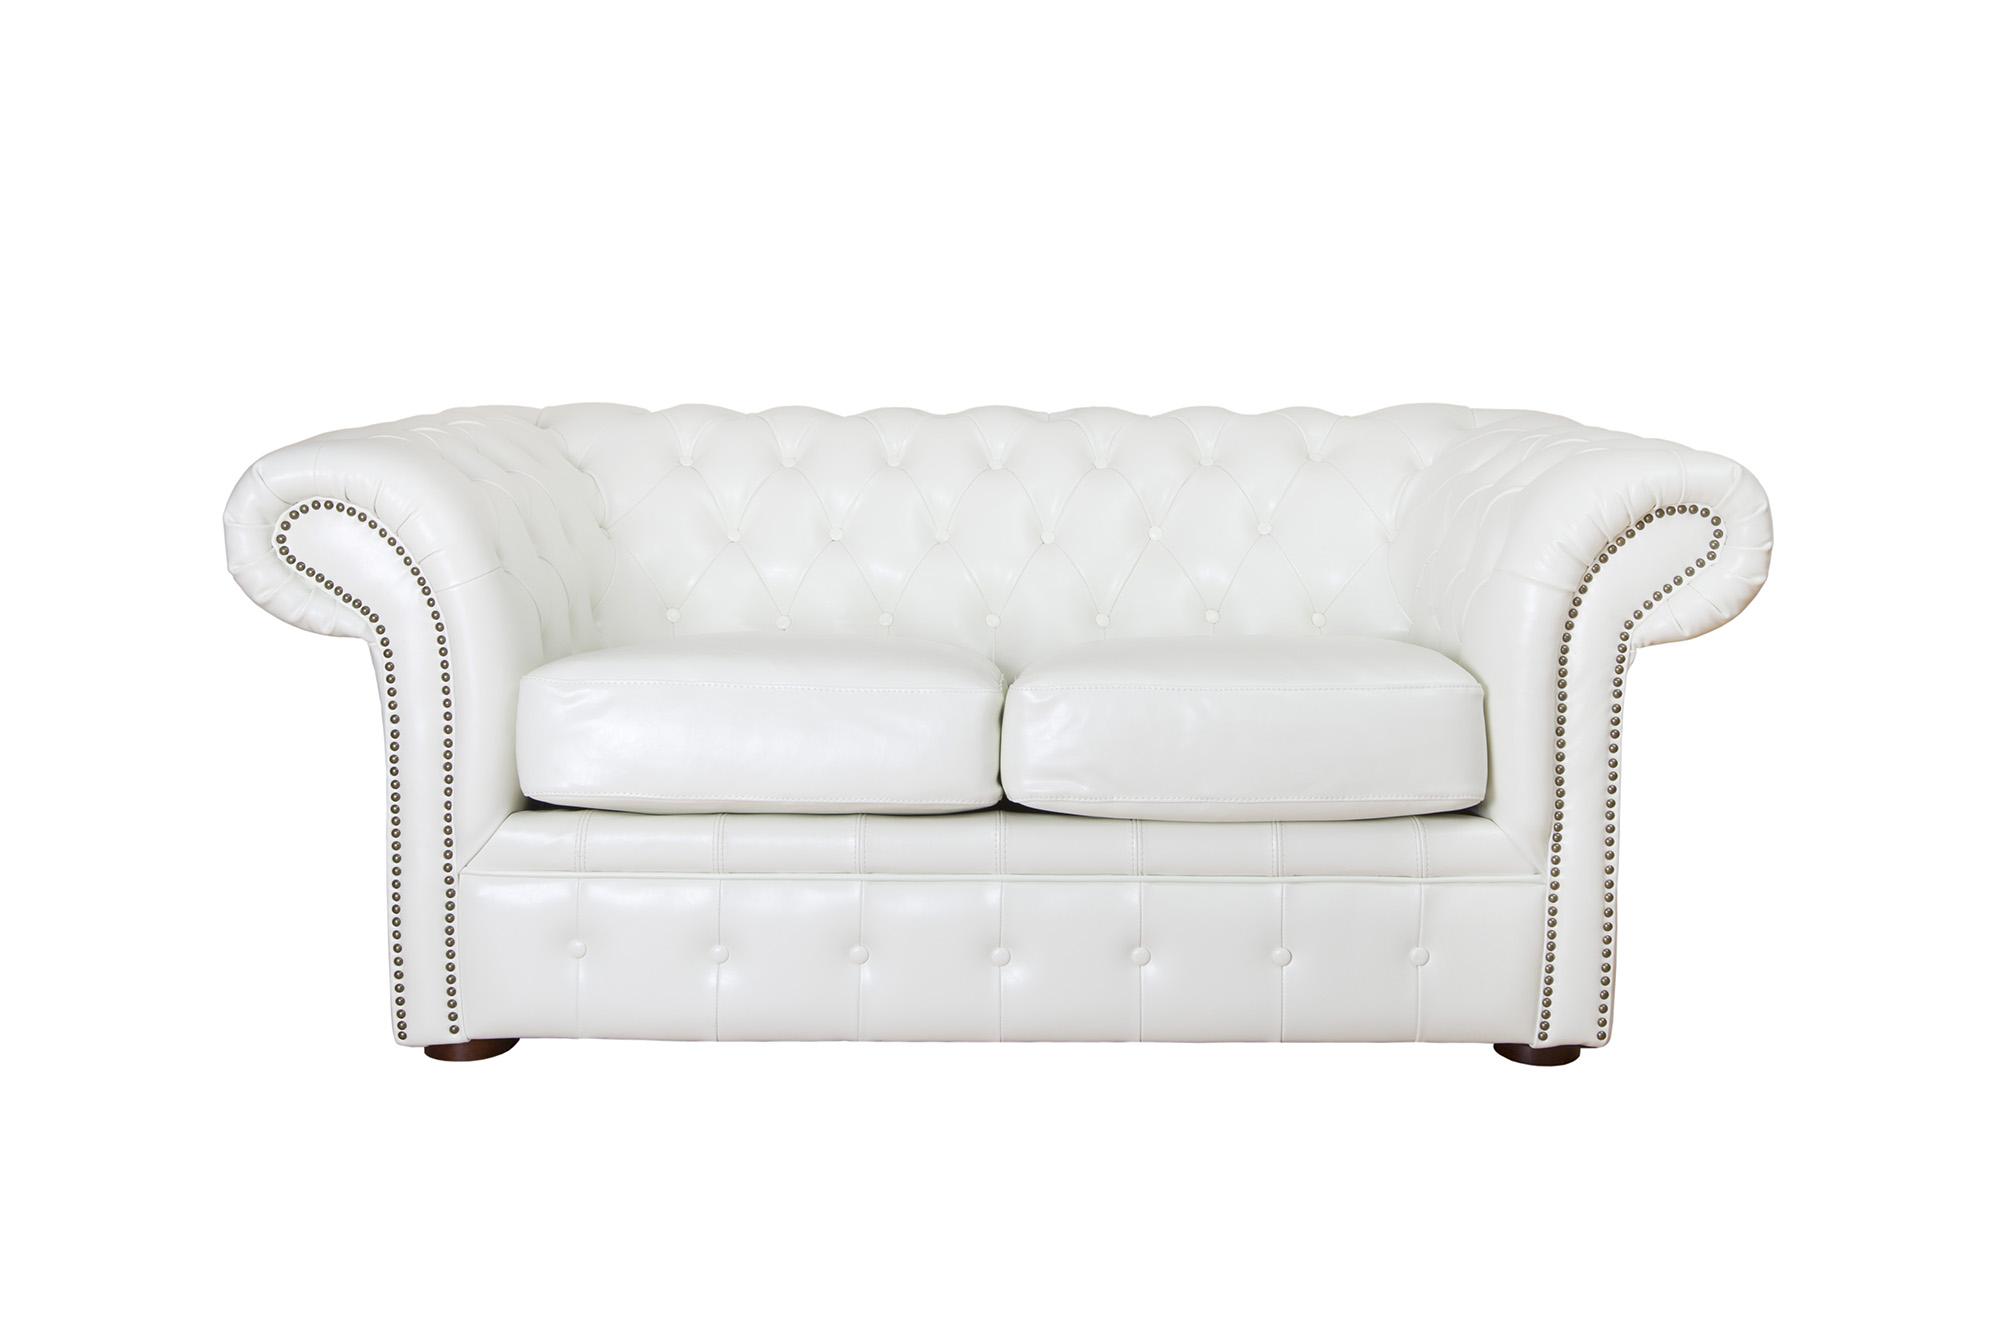 Белый стильный кожаный диван Честер